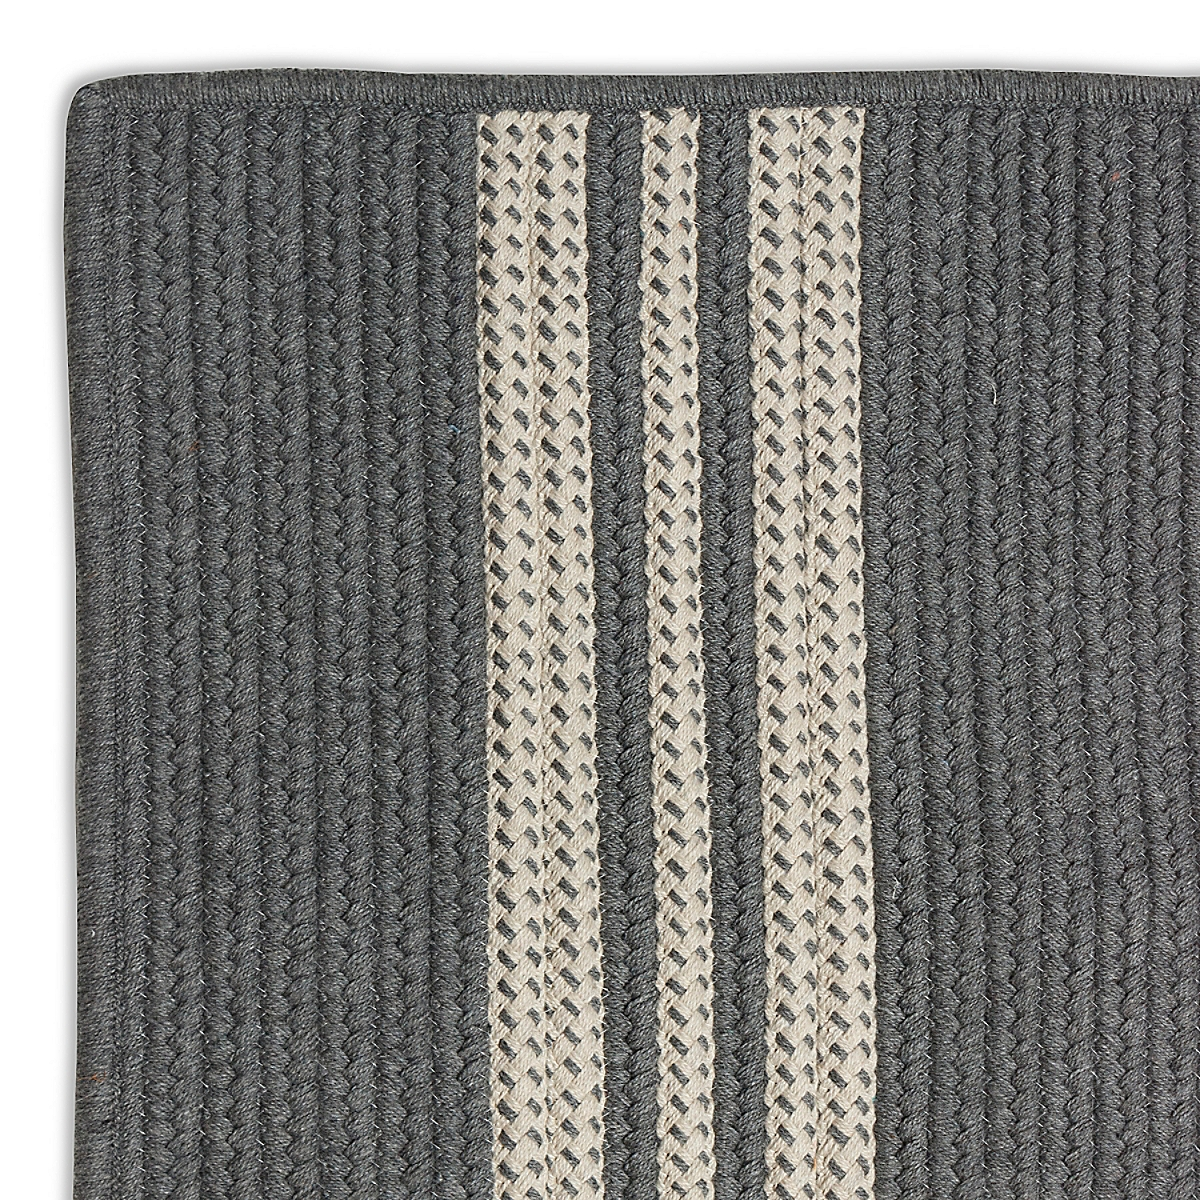 Sunbrella Longboard Rug - Slate